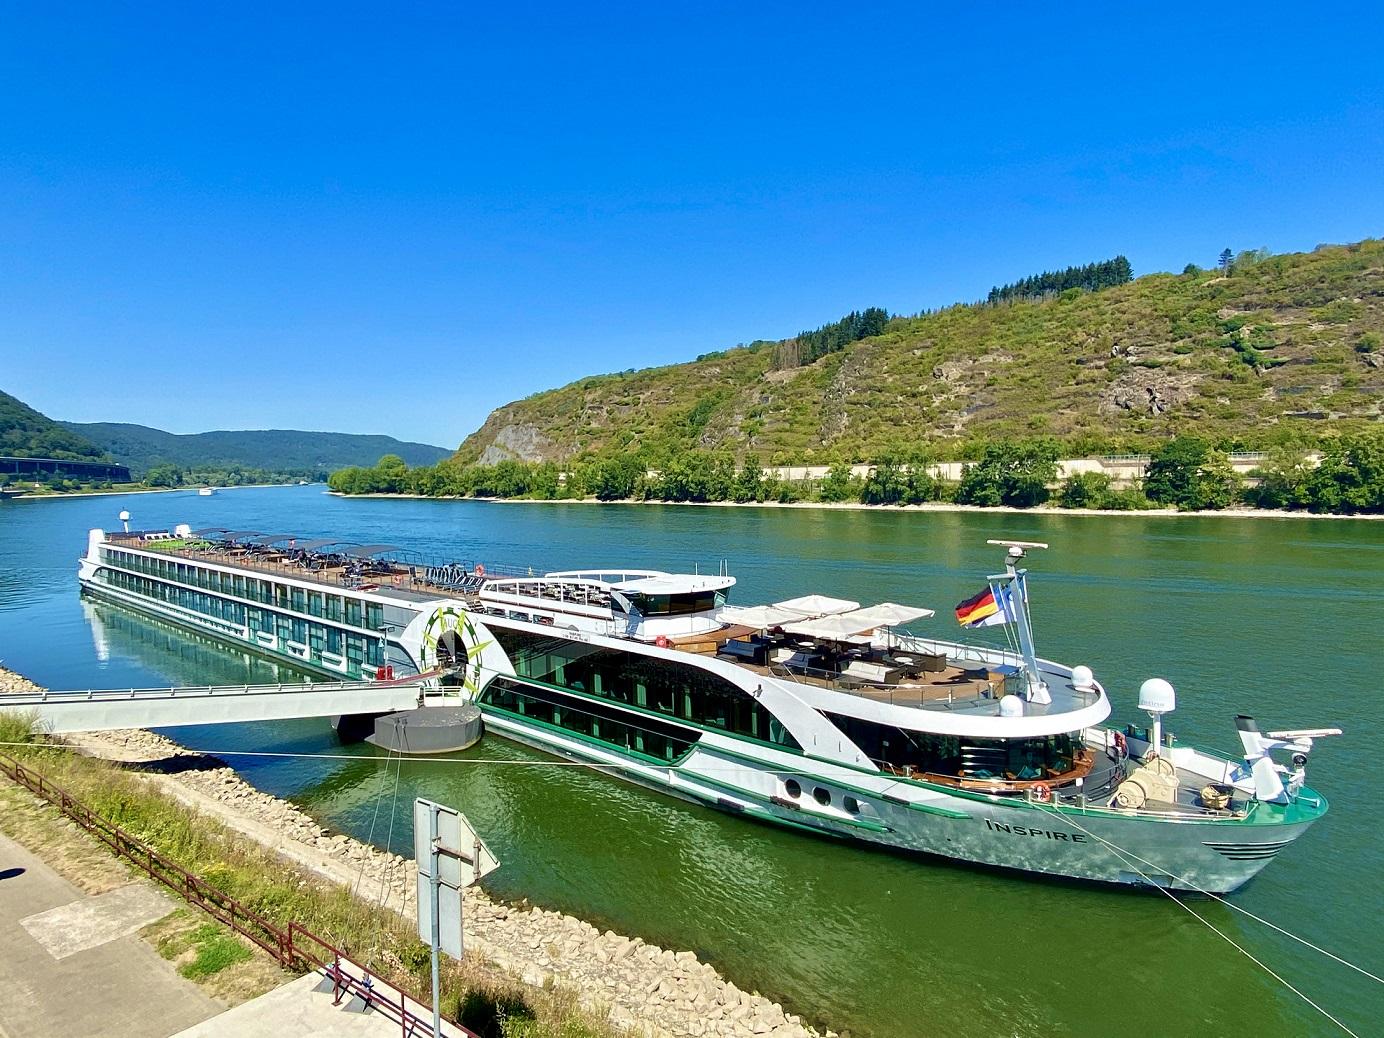 MS Inspire von Viva Cruises in Andernach.